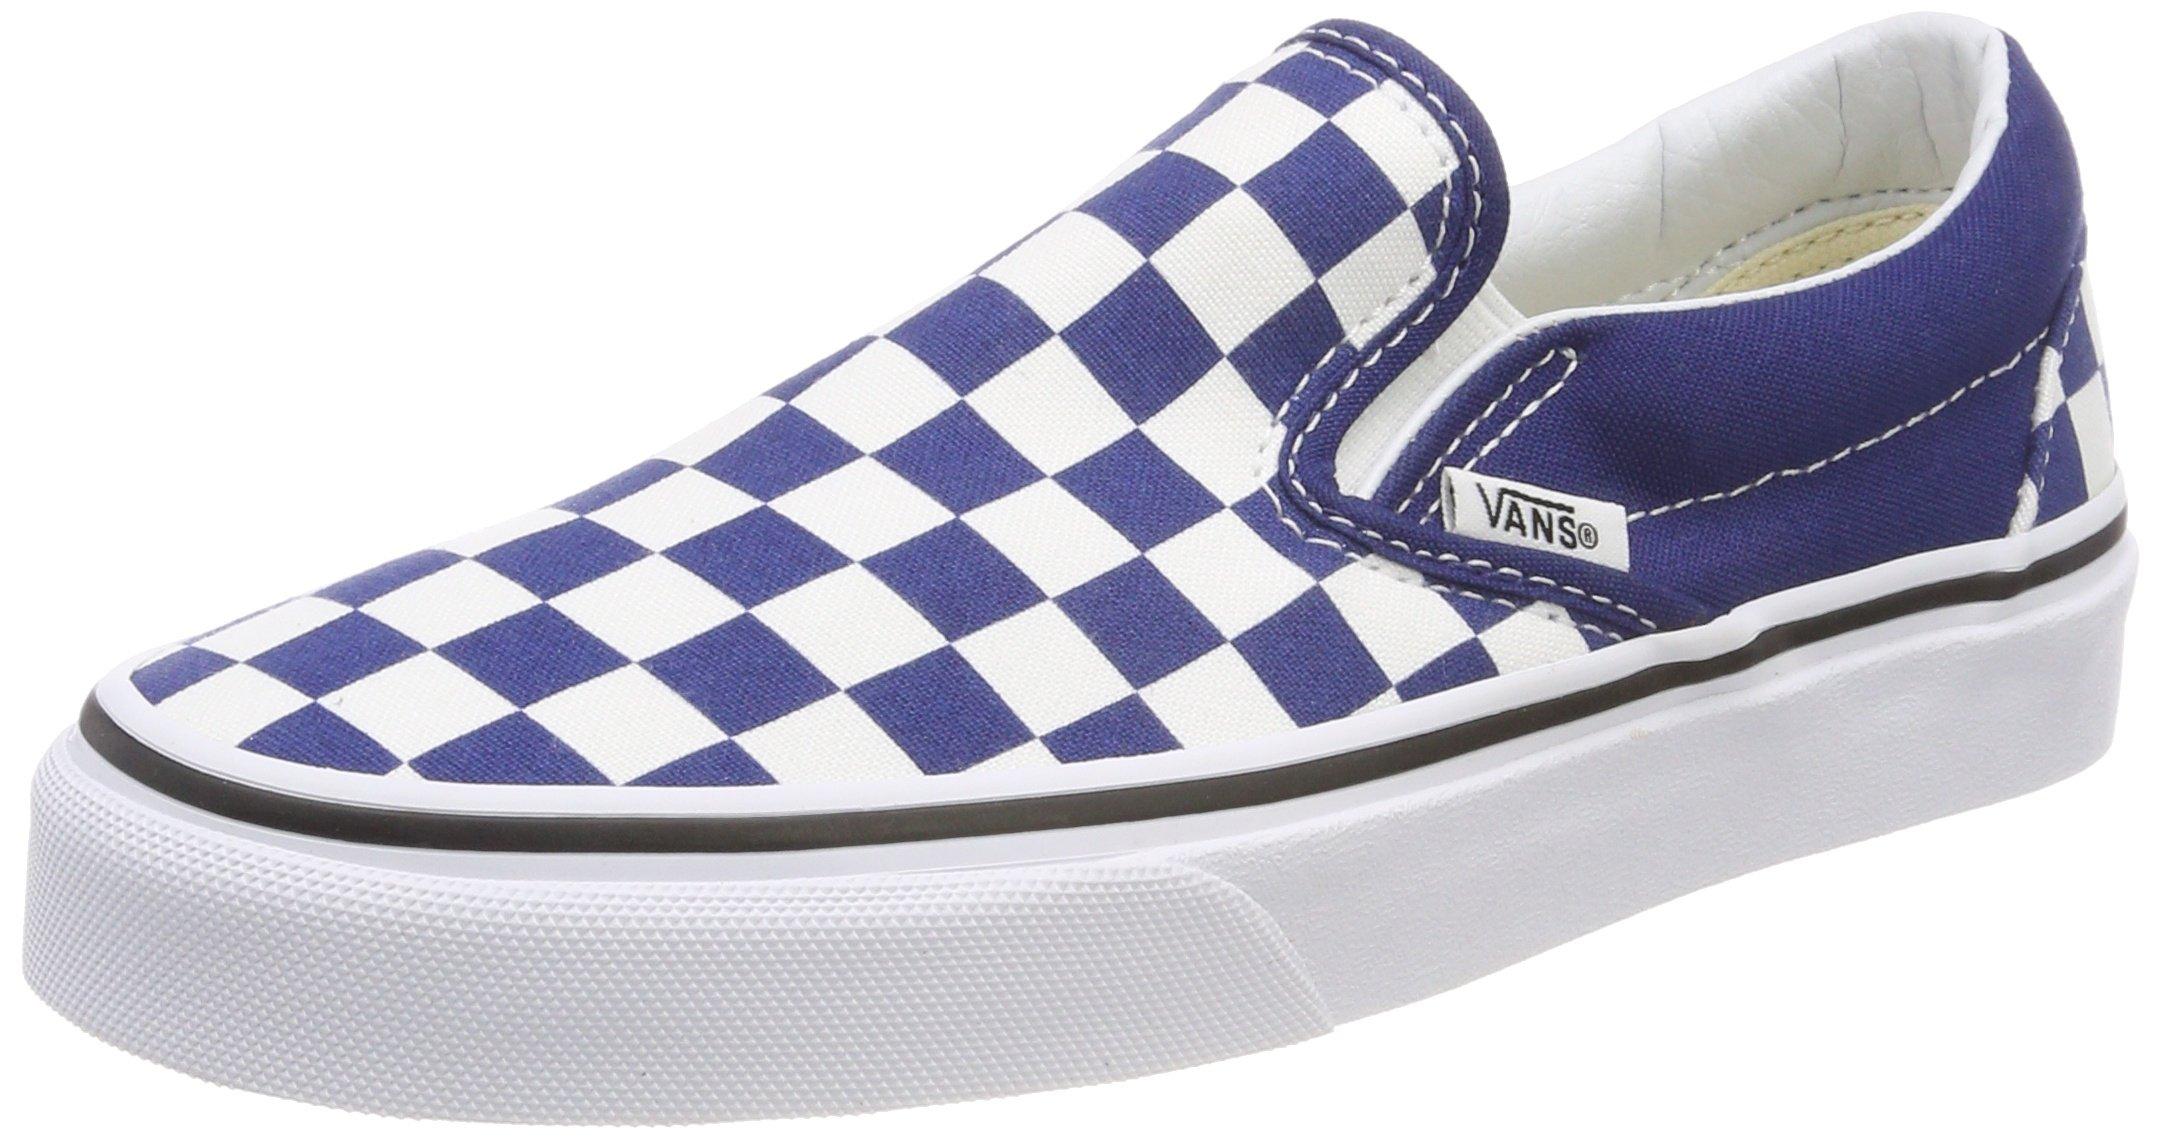 Vans Unisex Adults' Classic Slip on Trainers, Blue ((Checkerboard) Estate Blue/True White Qcn), 11 UK 46 EU